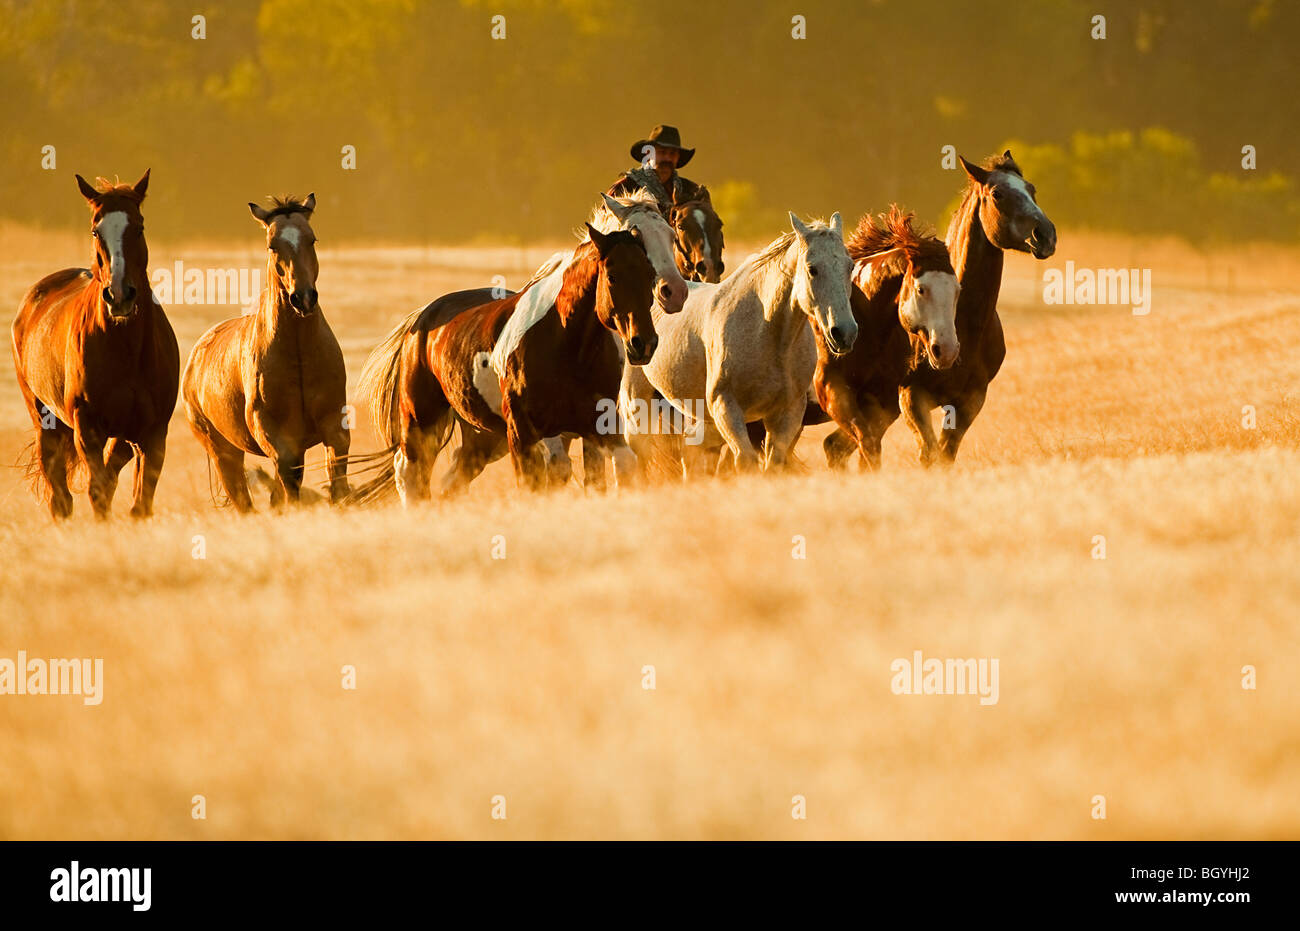 Cowboy herding horses Stock Photo